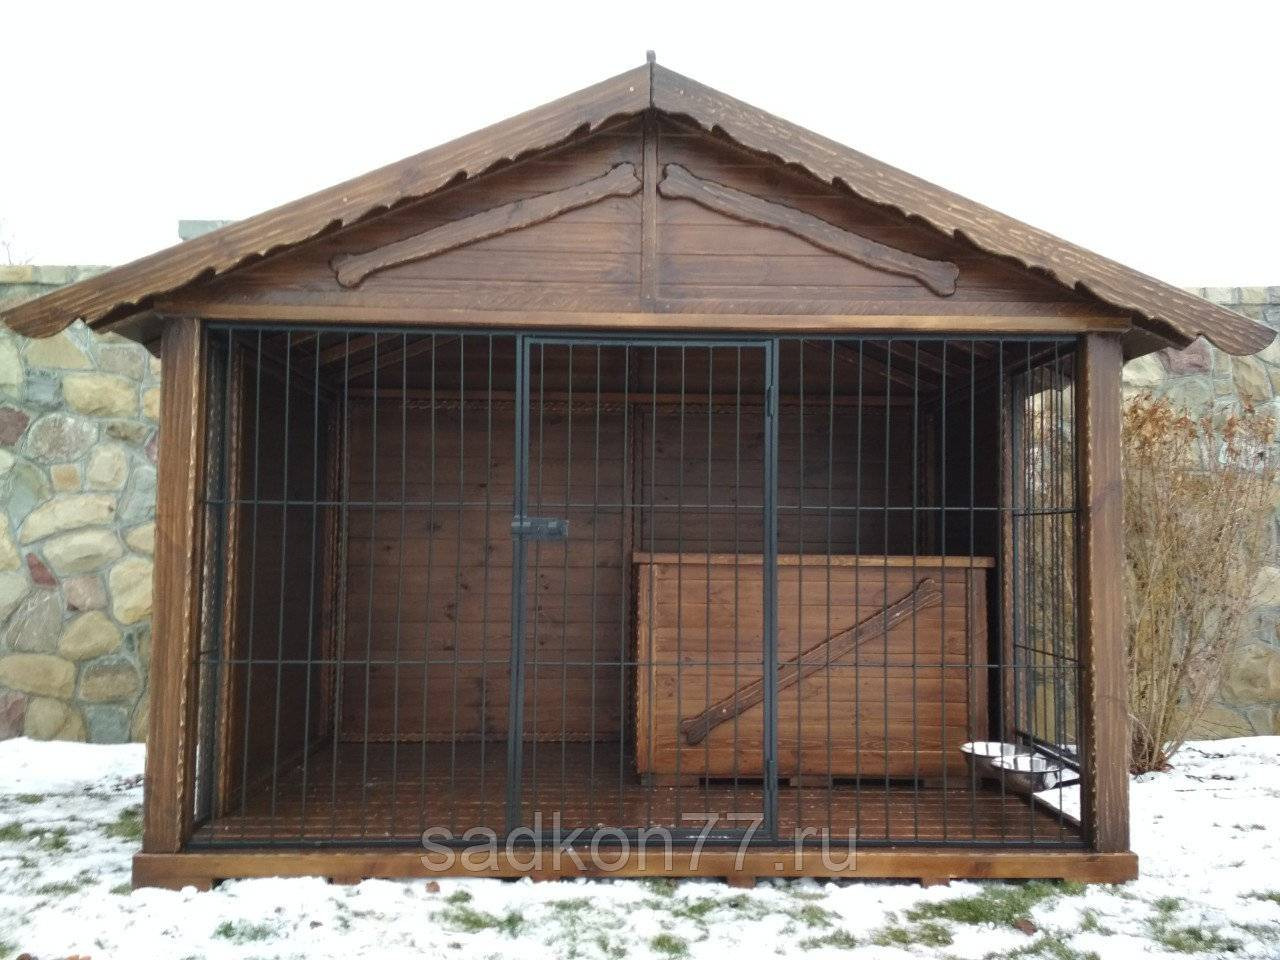 Вольер для овчарки (немецкой) во дворе частного дома